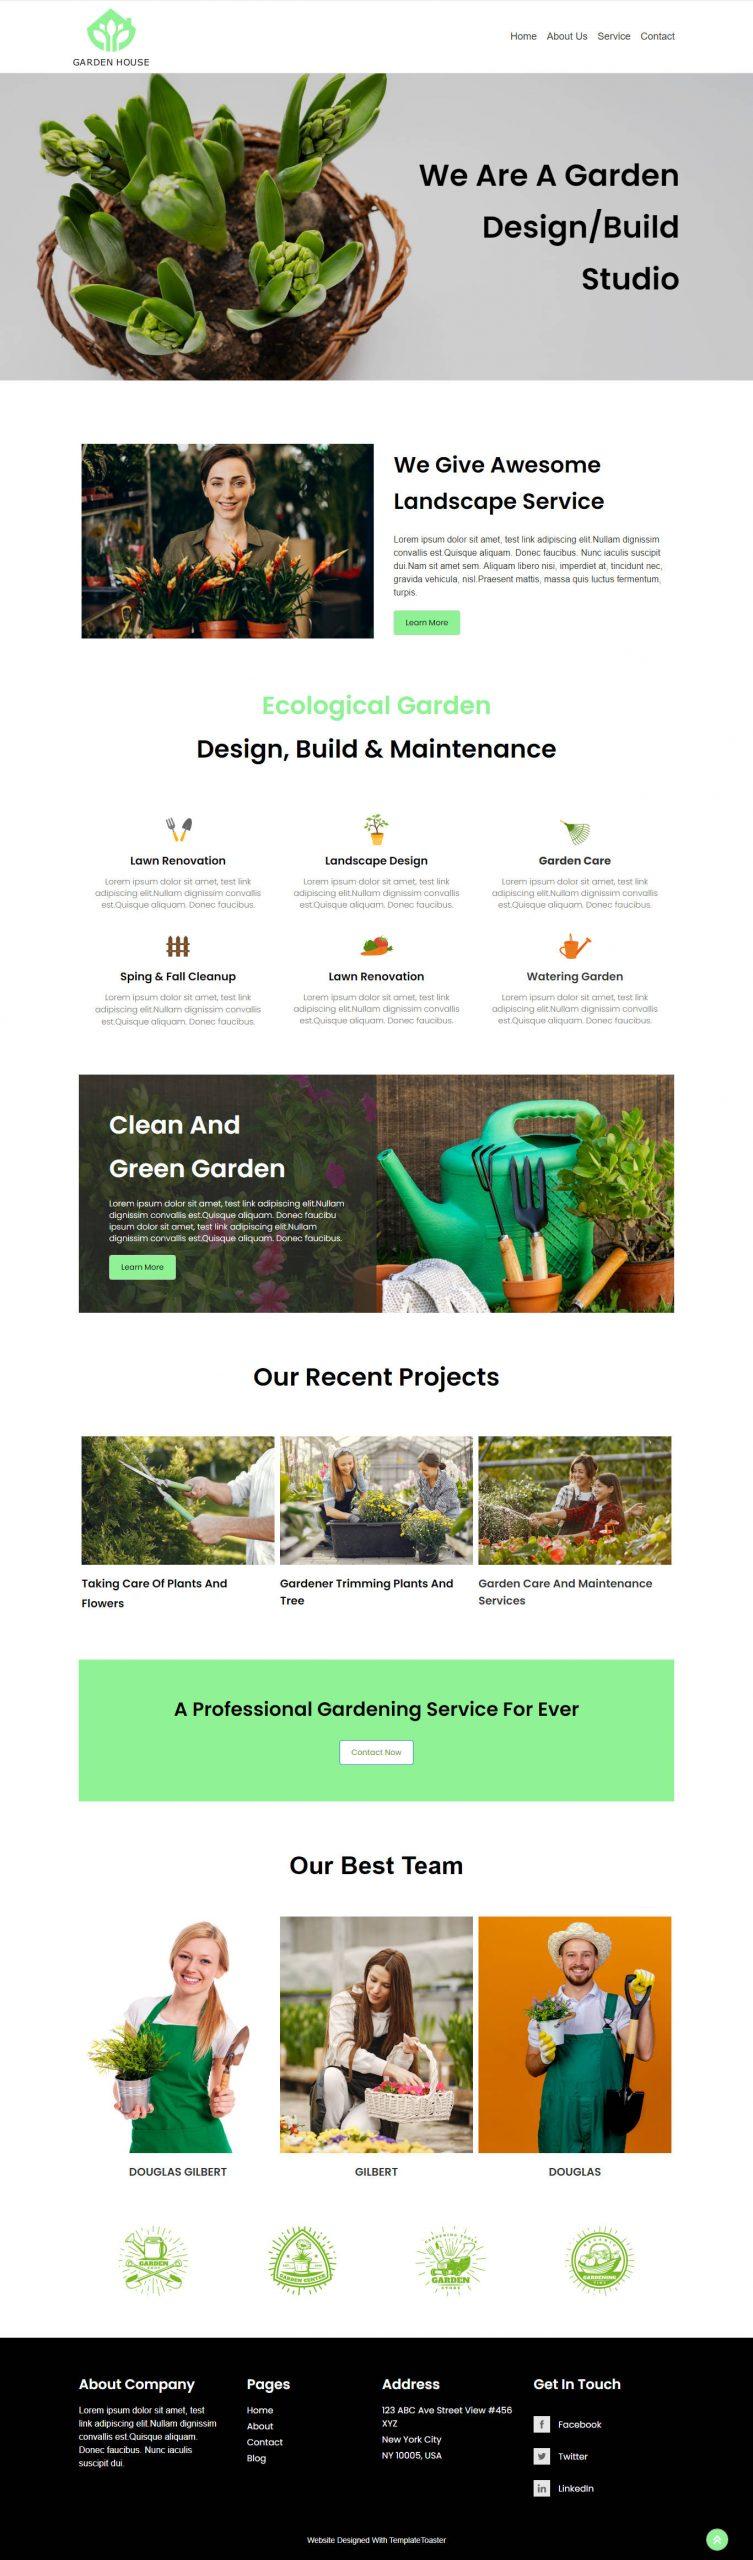 Backyard Lawn - Garden Care Template